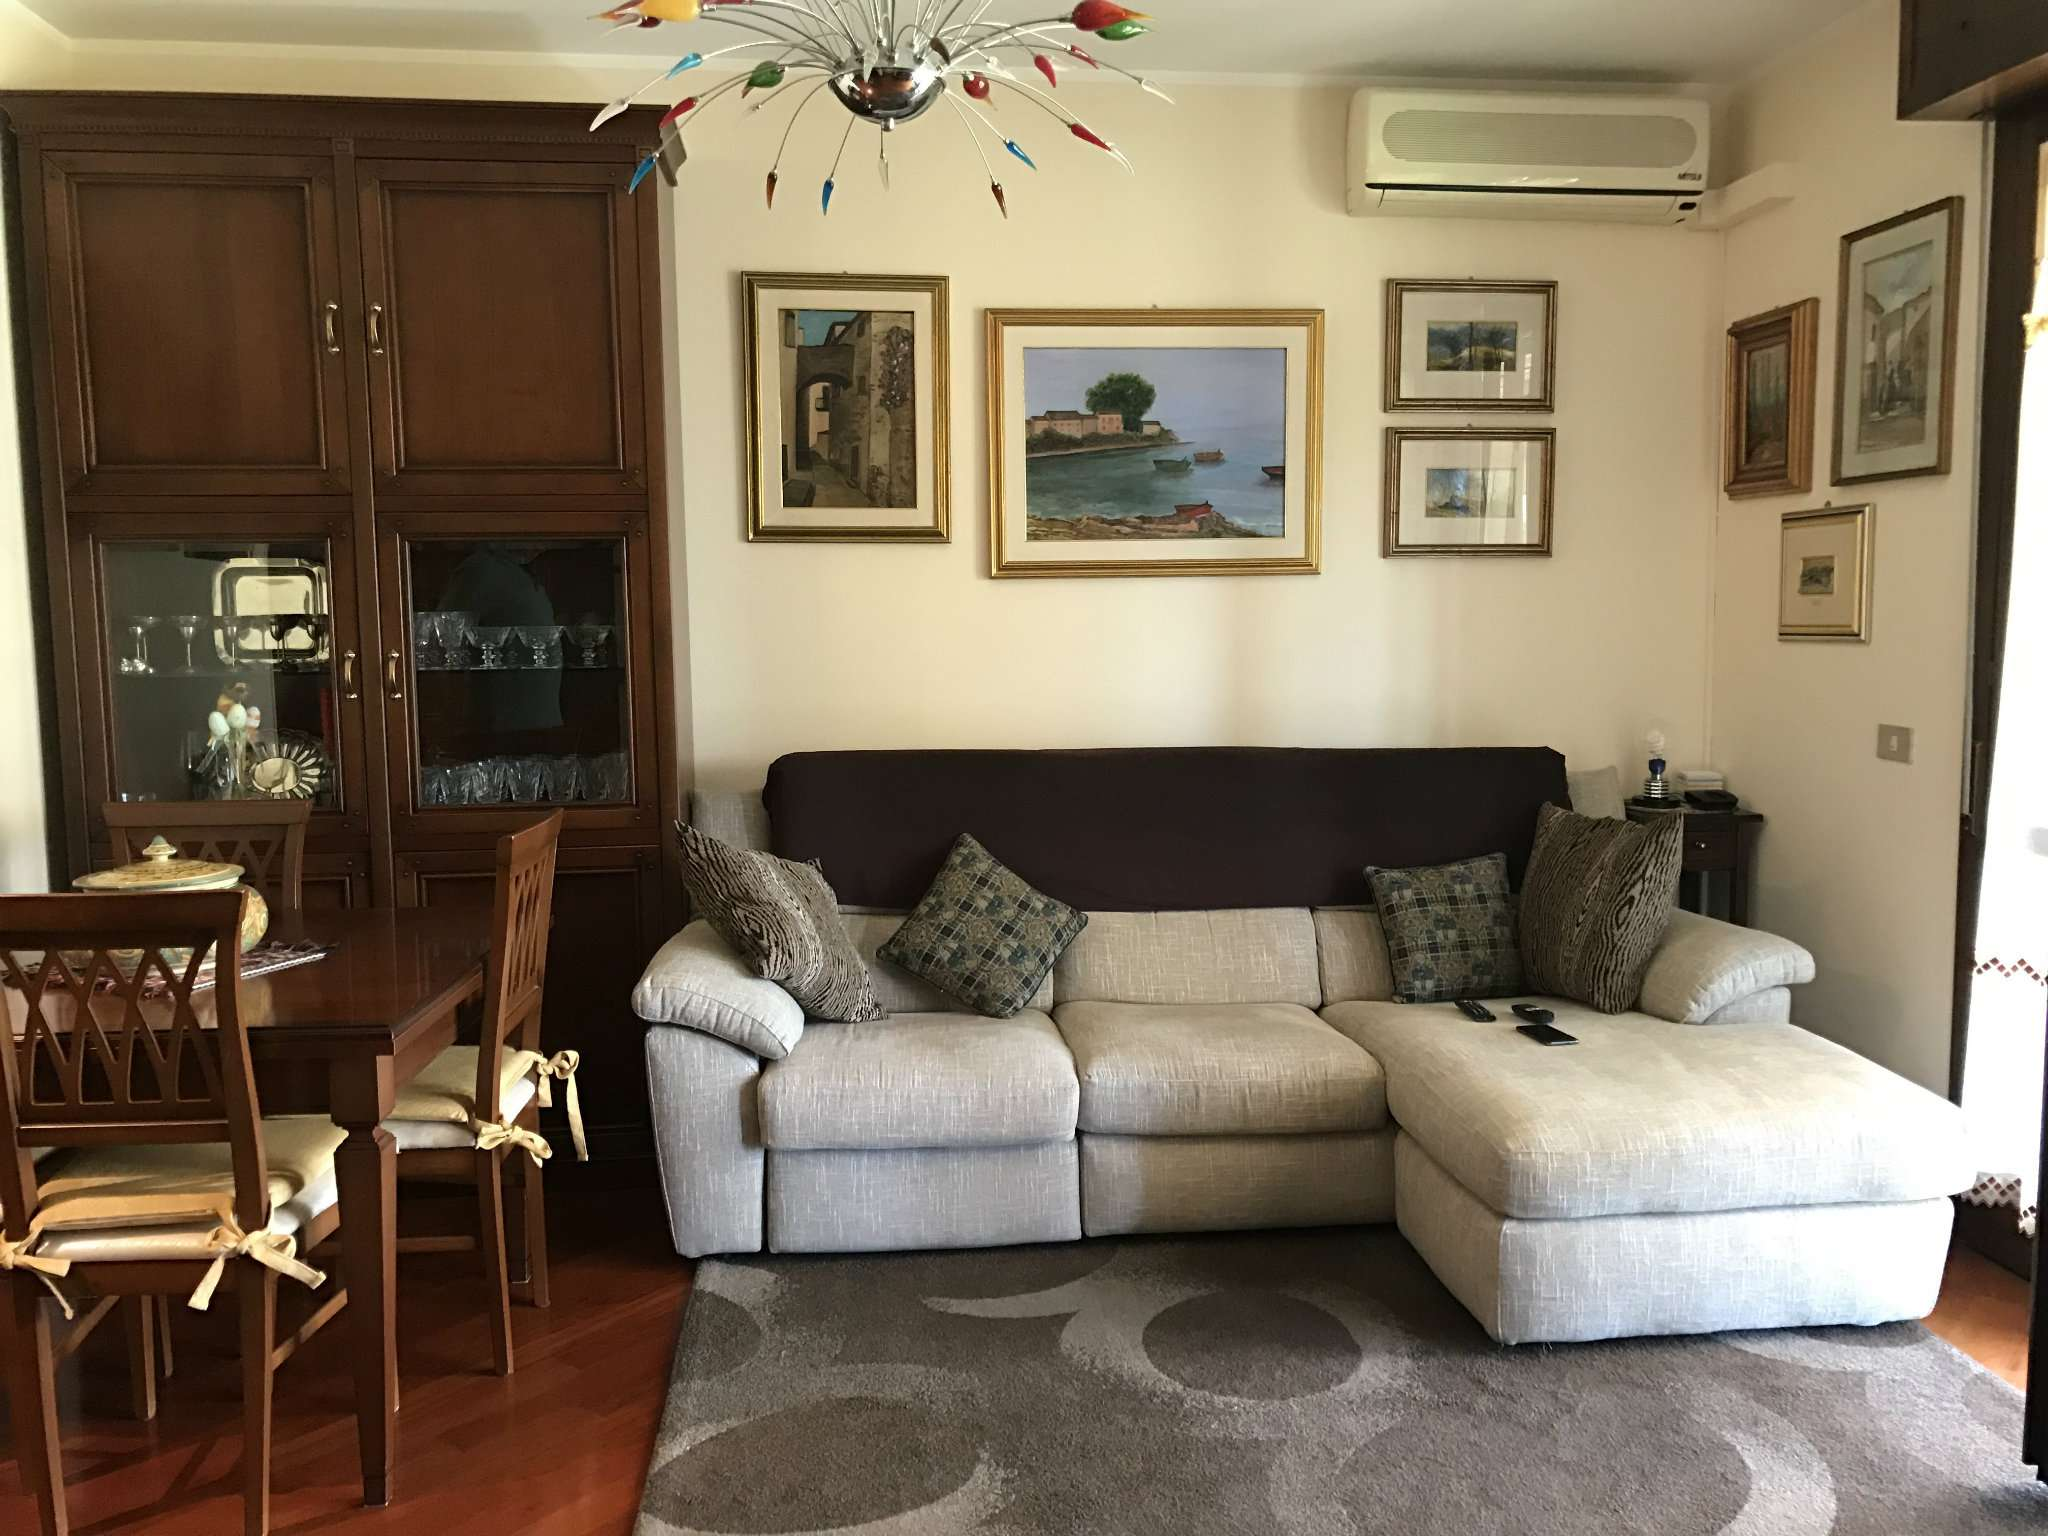 Foto 1 di Appartamento via Mirri, Medicina